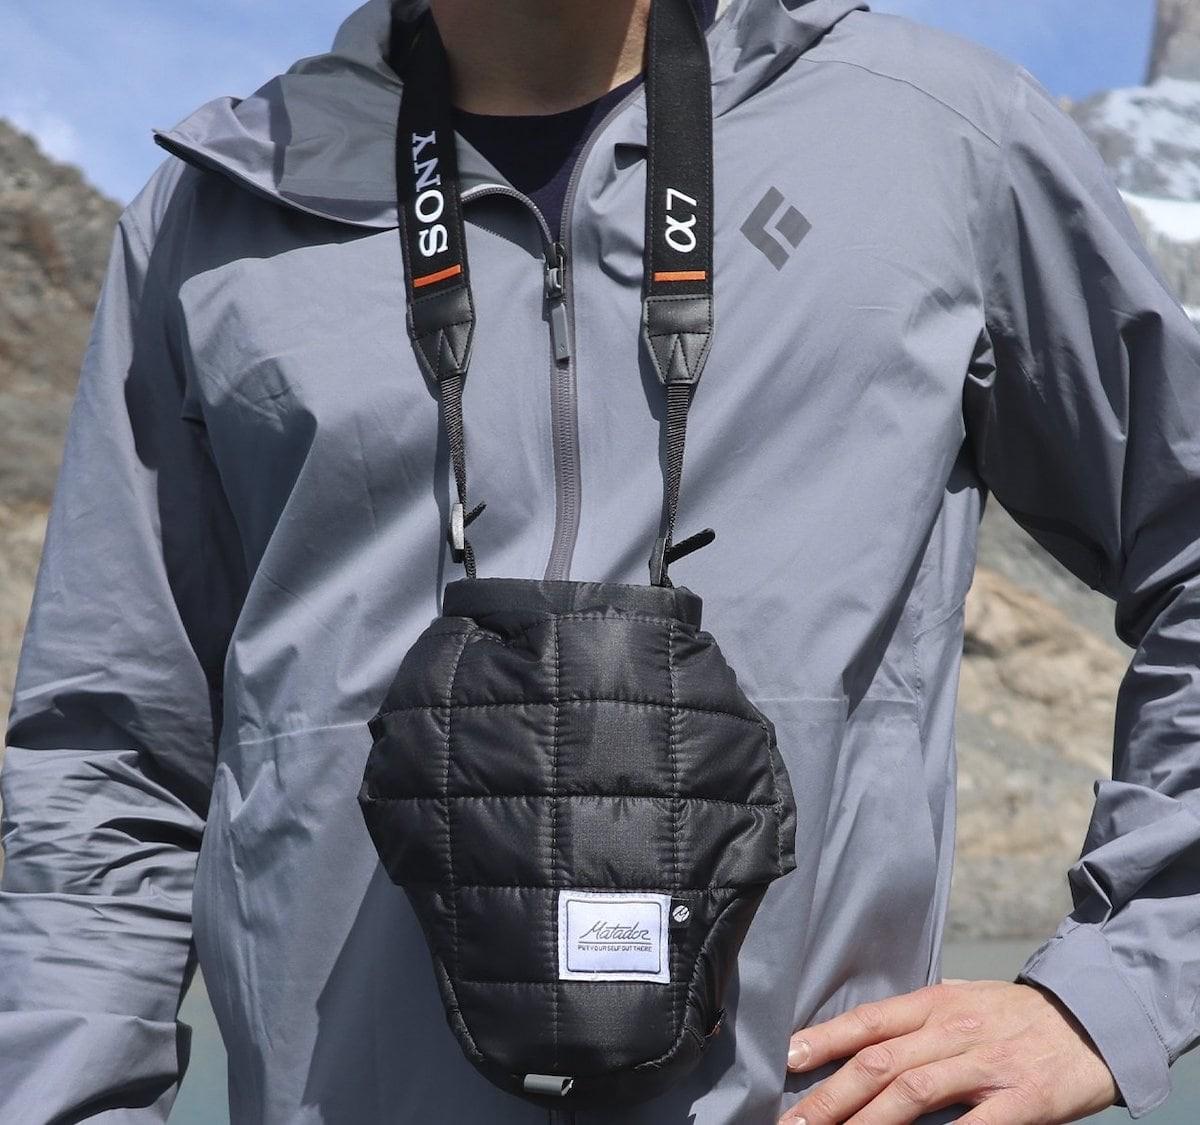 Matador Camera Base Layer Technical Shell keeps your camera nice and warm